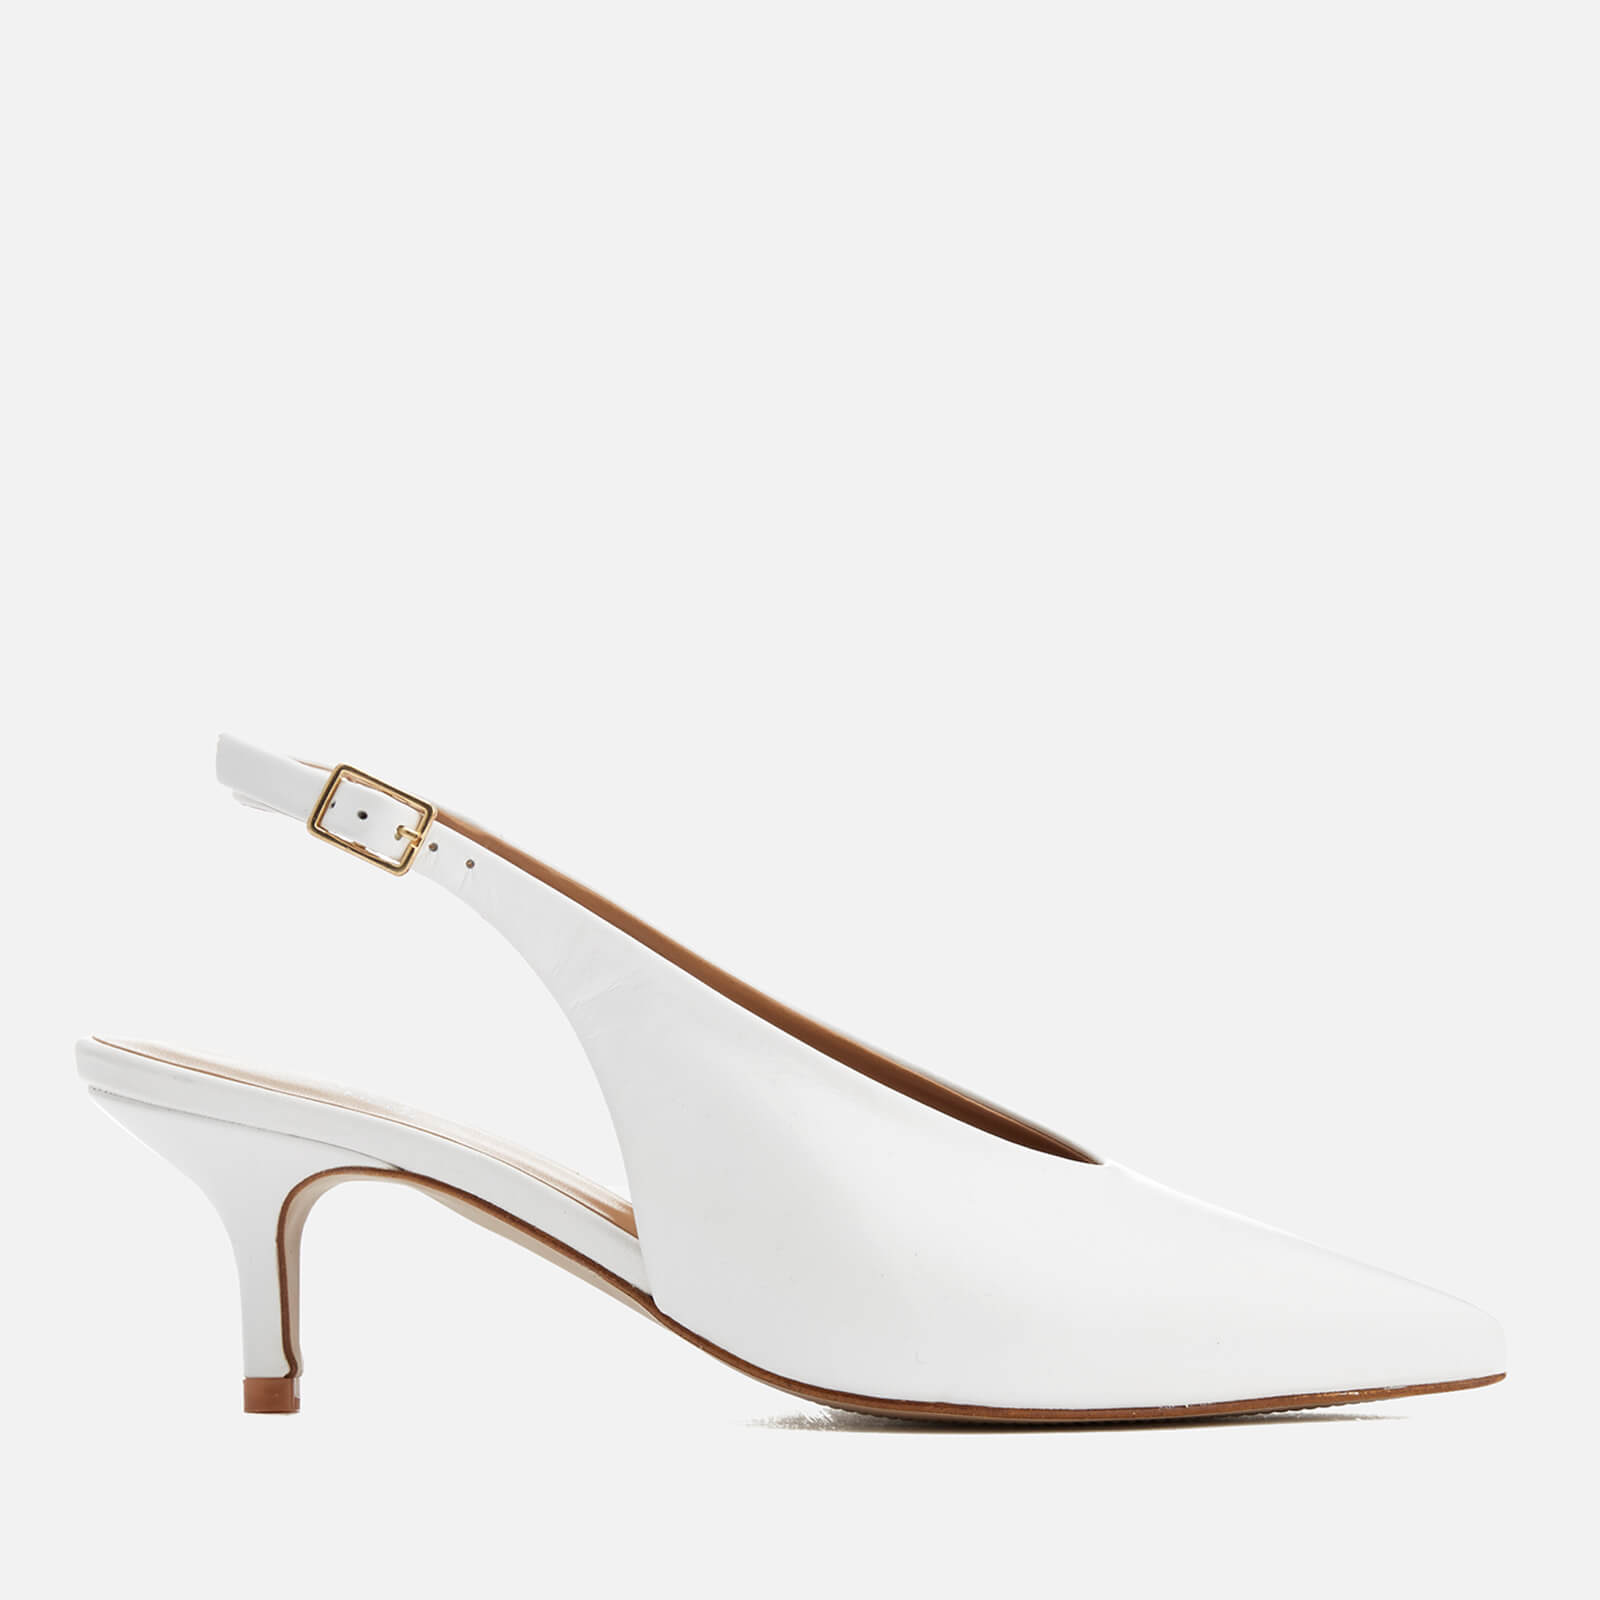 55db084006 Carvela Women's Amy Leather Sling Back Pointed Kitten Heels - White